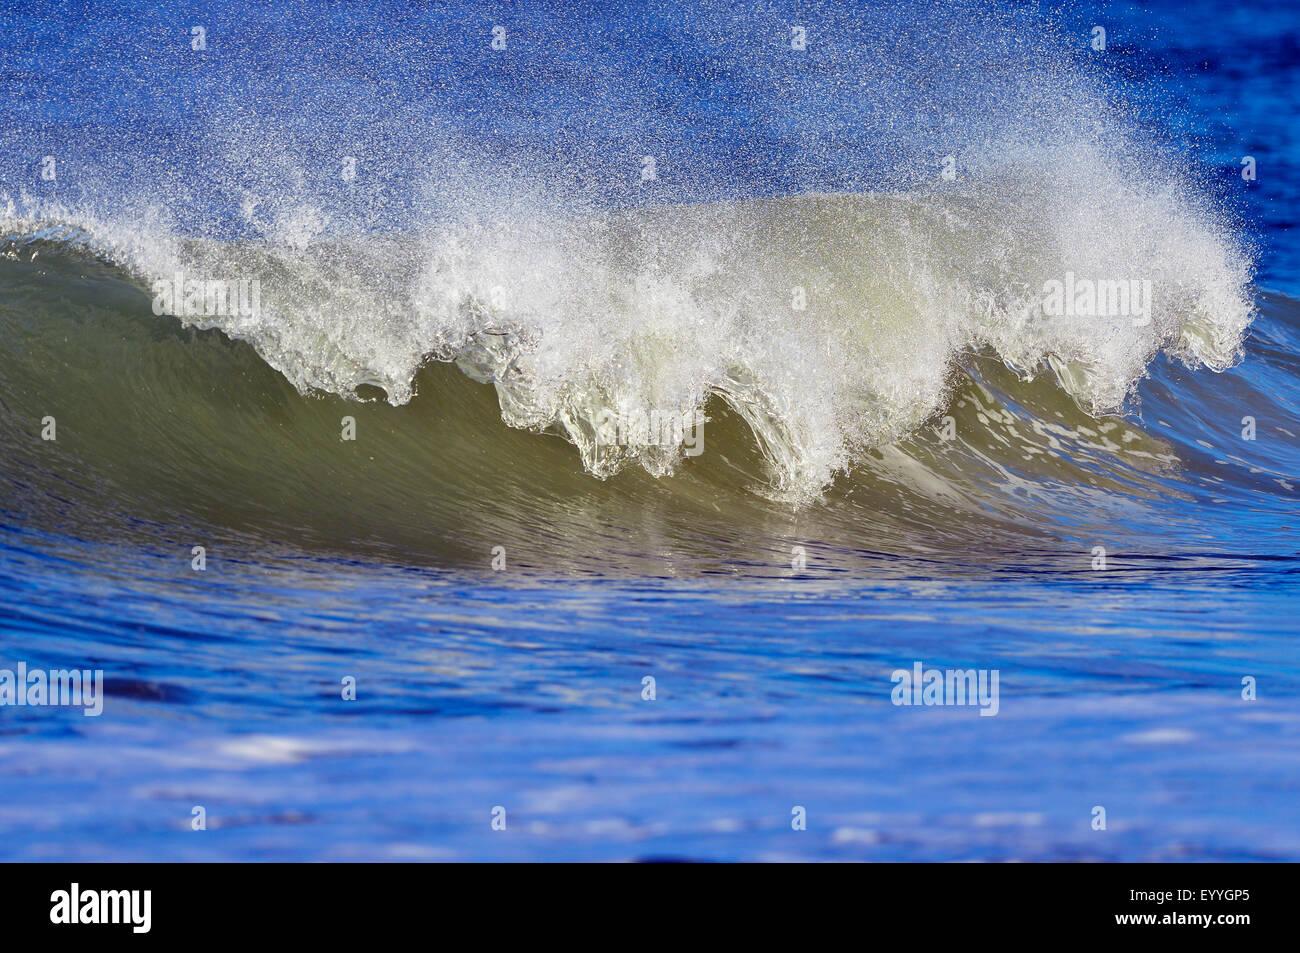 breaking wave, Germany, Schleswig-Holstein, Heligoland - Stock Image